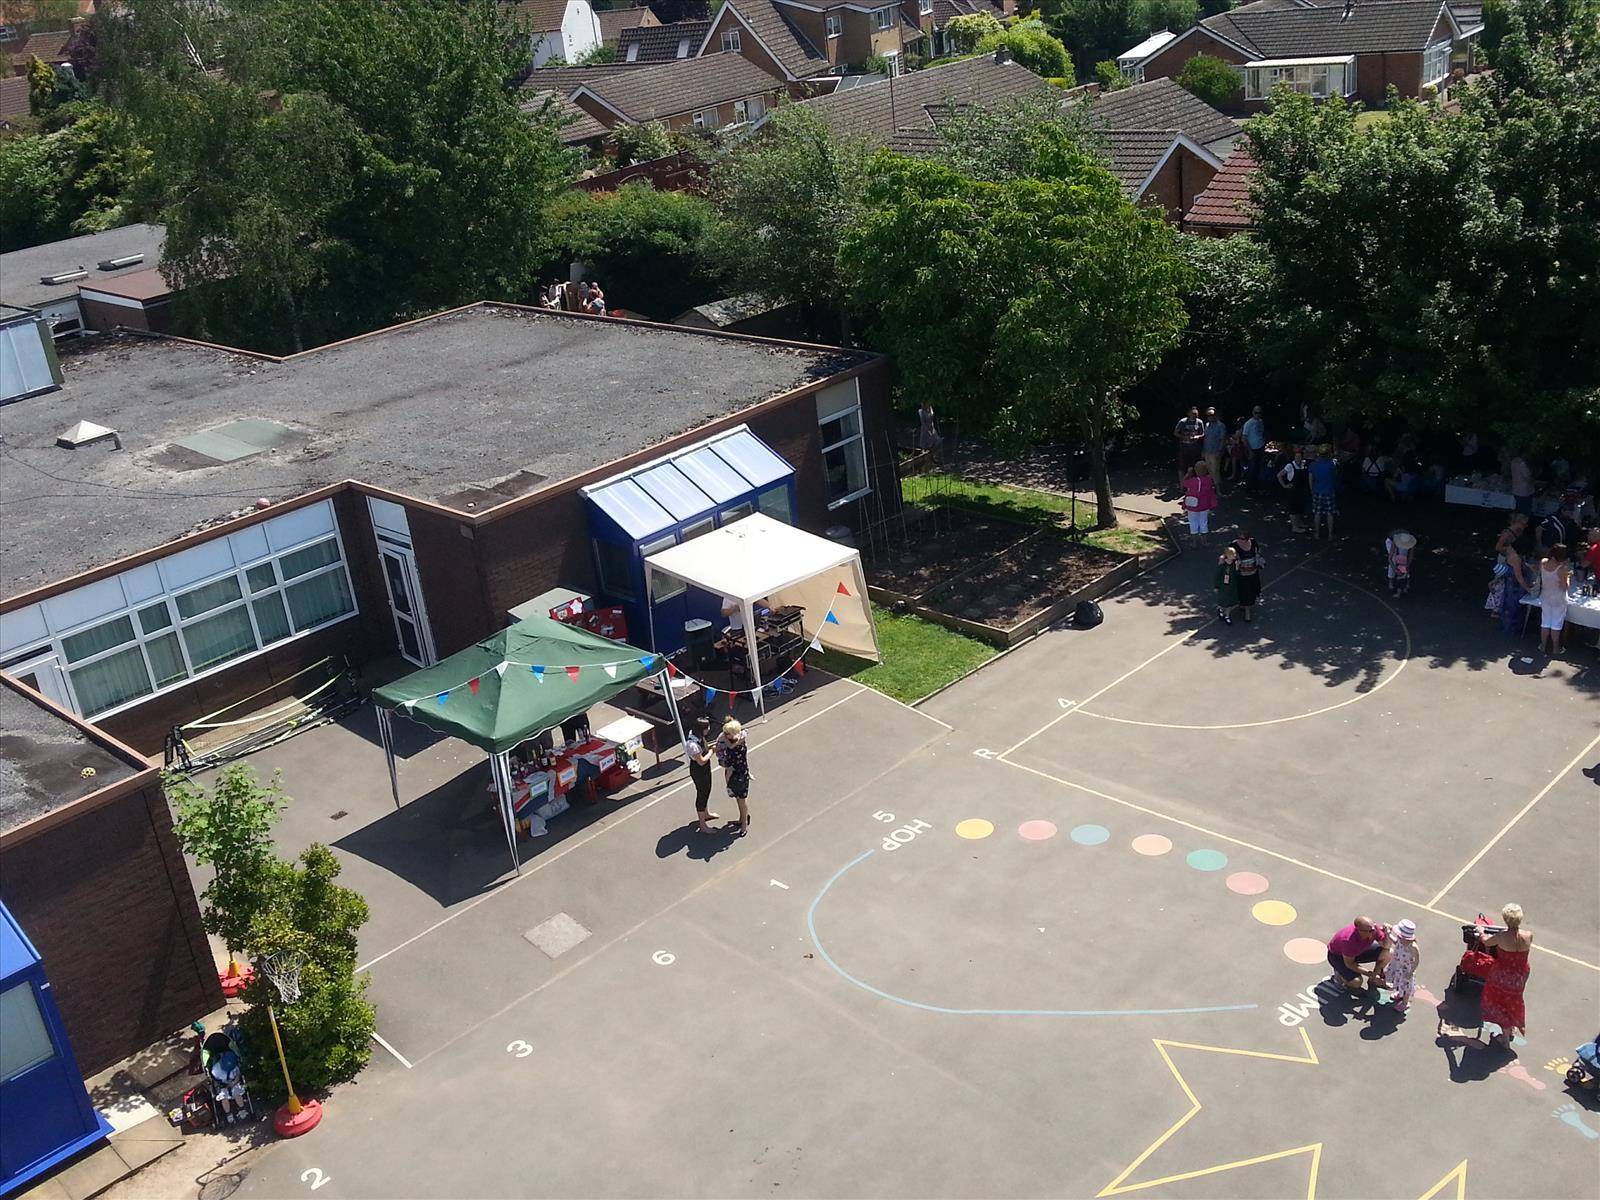 Lowdham Primary School from the TL